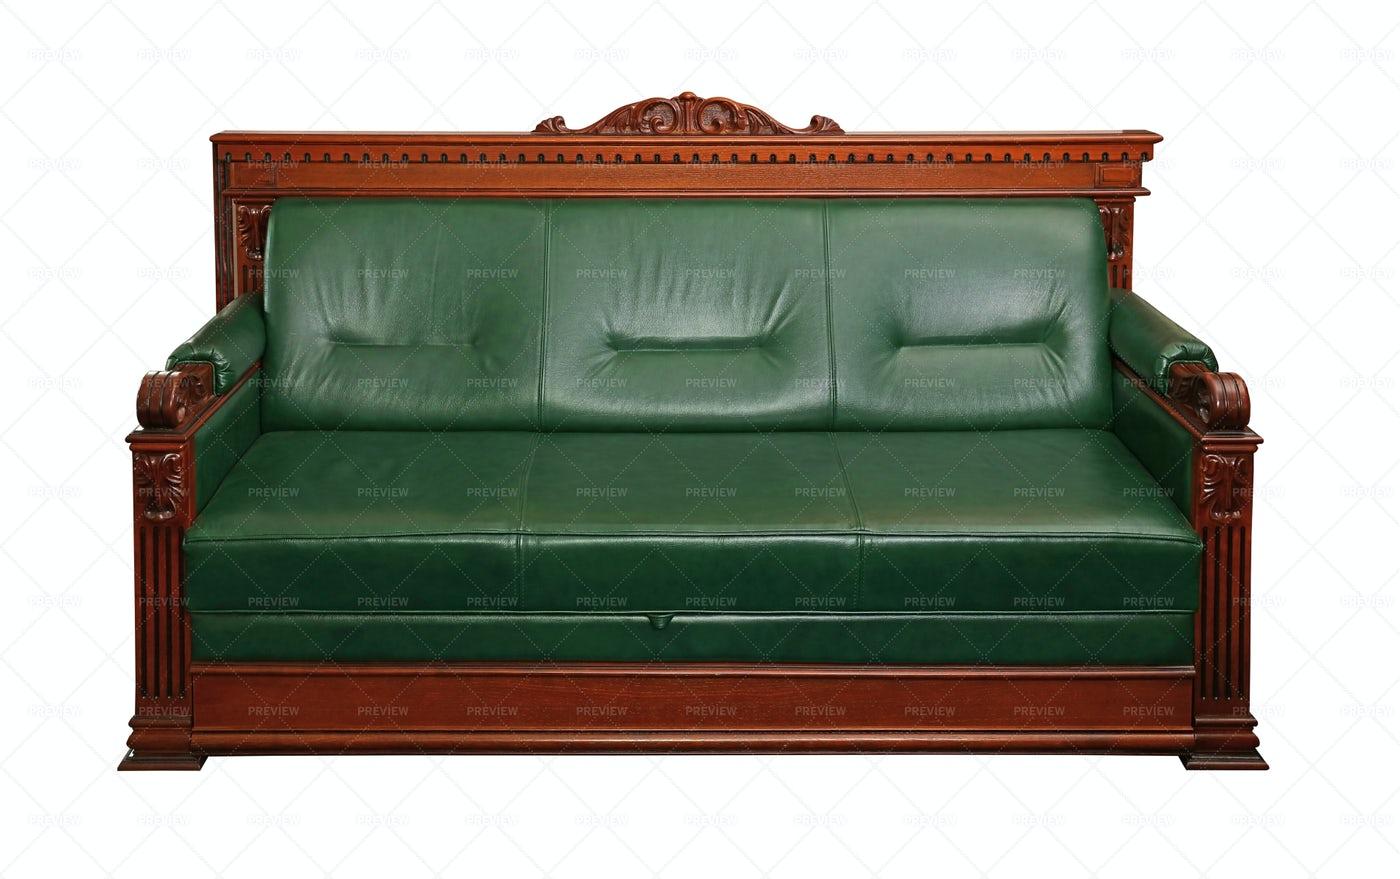 Green Leather Sofa: Stock Photos